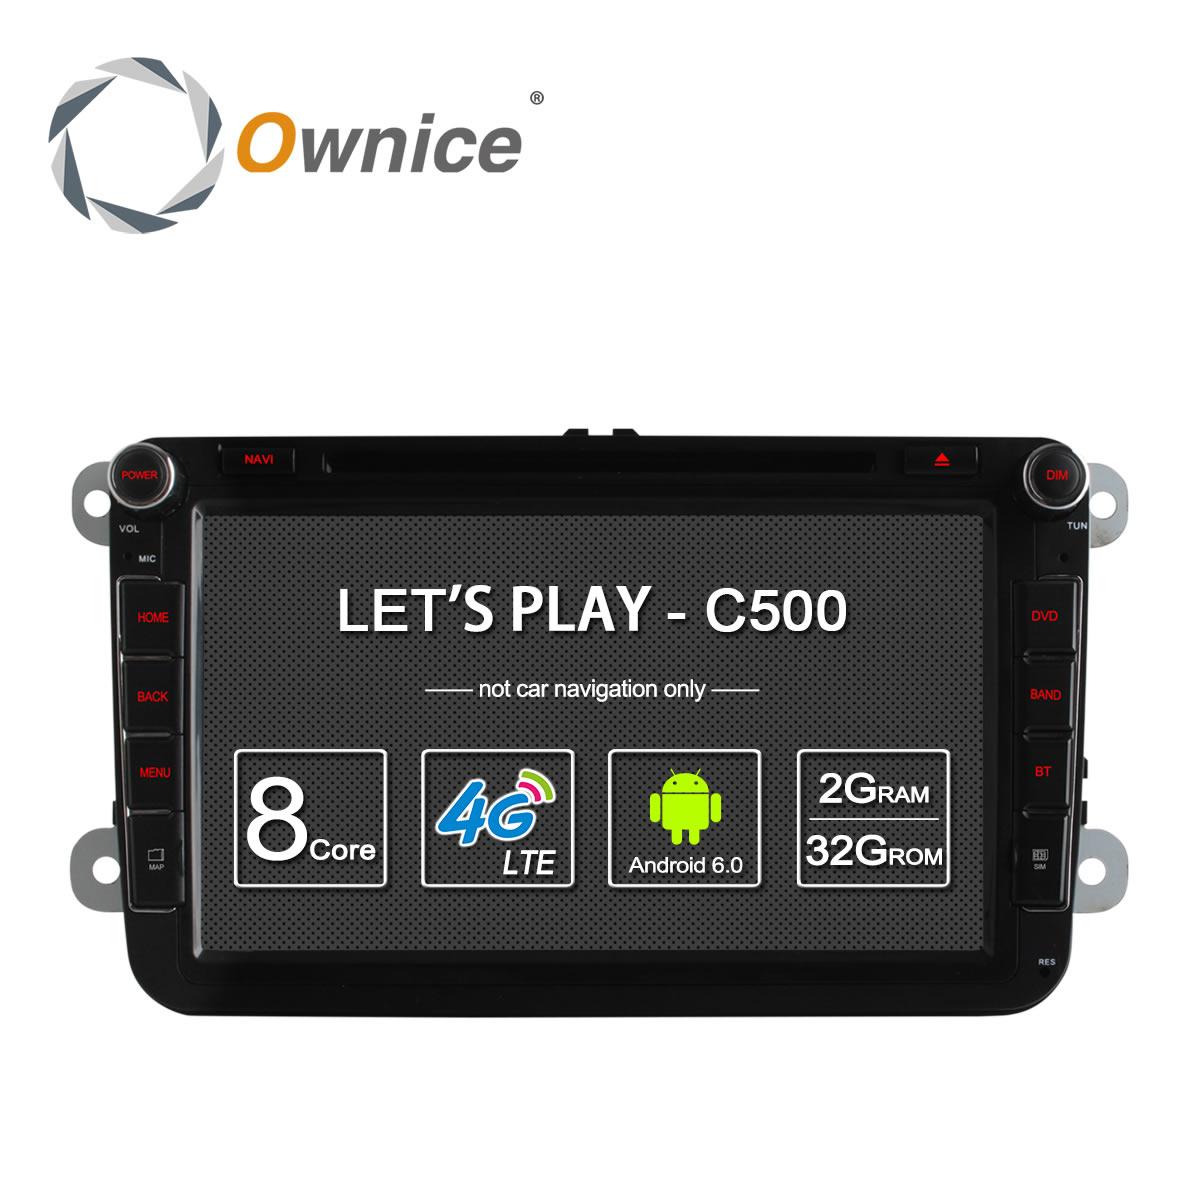 4G SIM LTE Réseau Ownice K1 K2 Octa 8 Core Android 8.1 2G RAM 2 Din Voiture DVD GPS Navi Radio Lecteur Pour VW Skoda Octavia 2